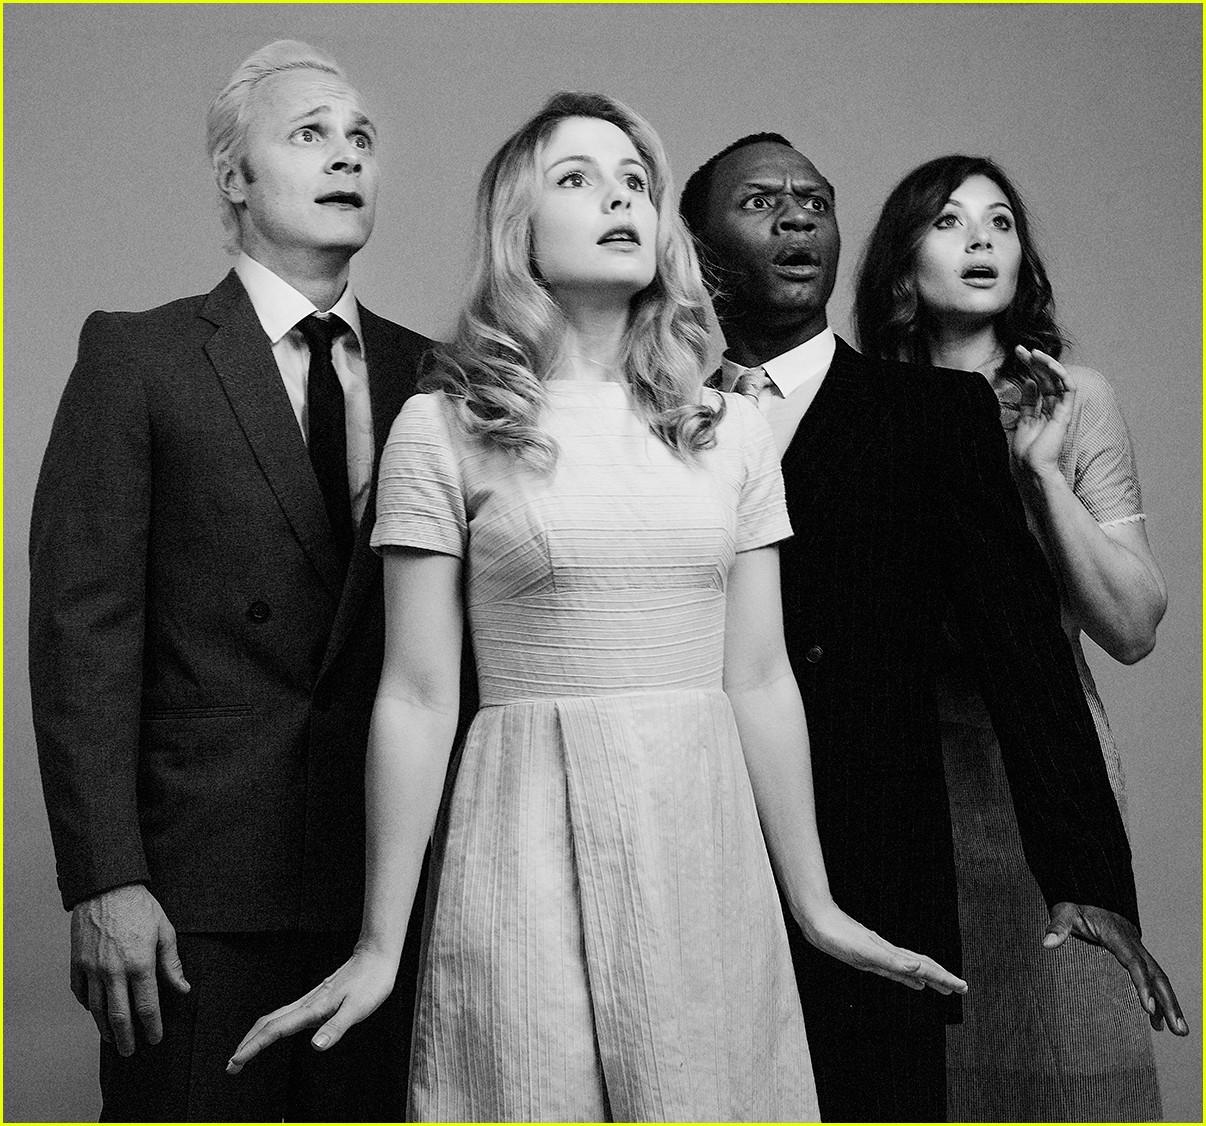 Rose mciver izombie cast go classic for new photo shoot